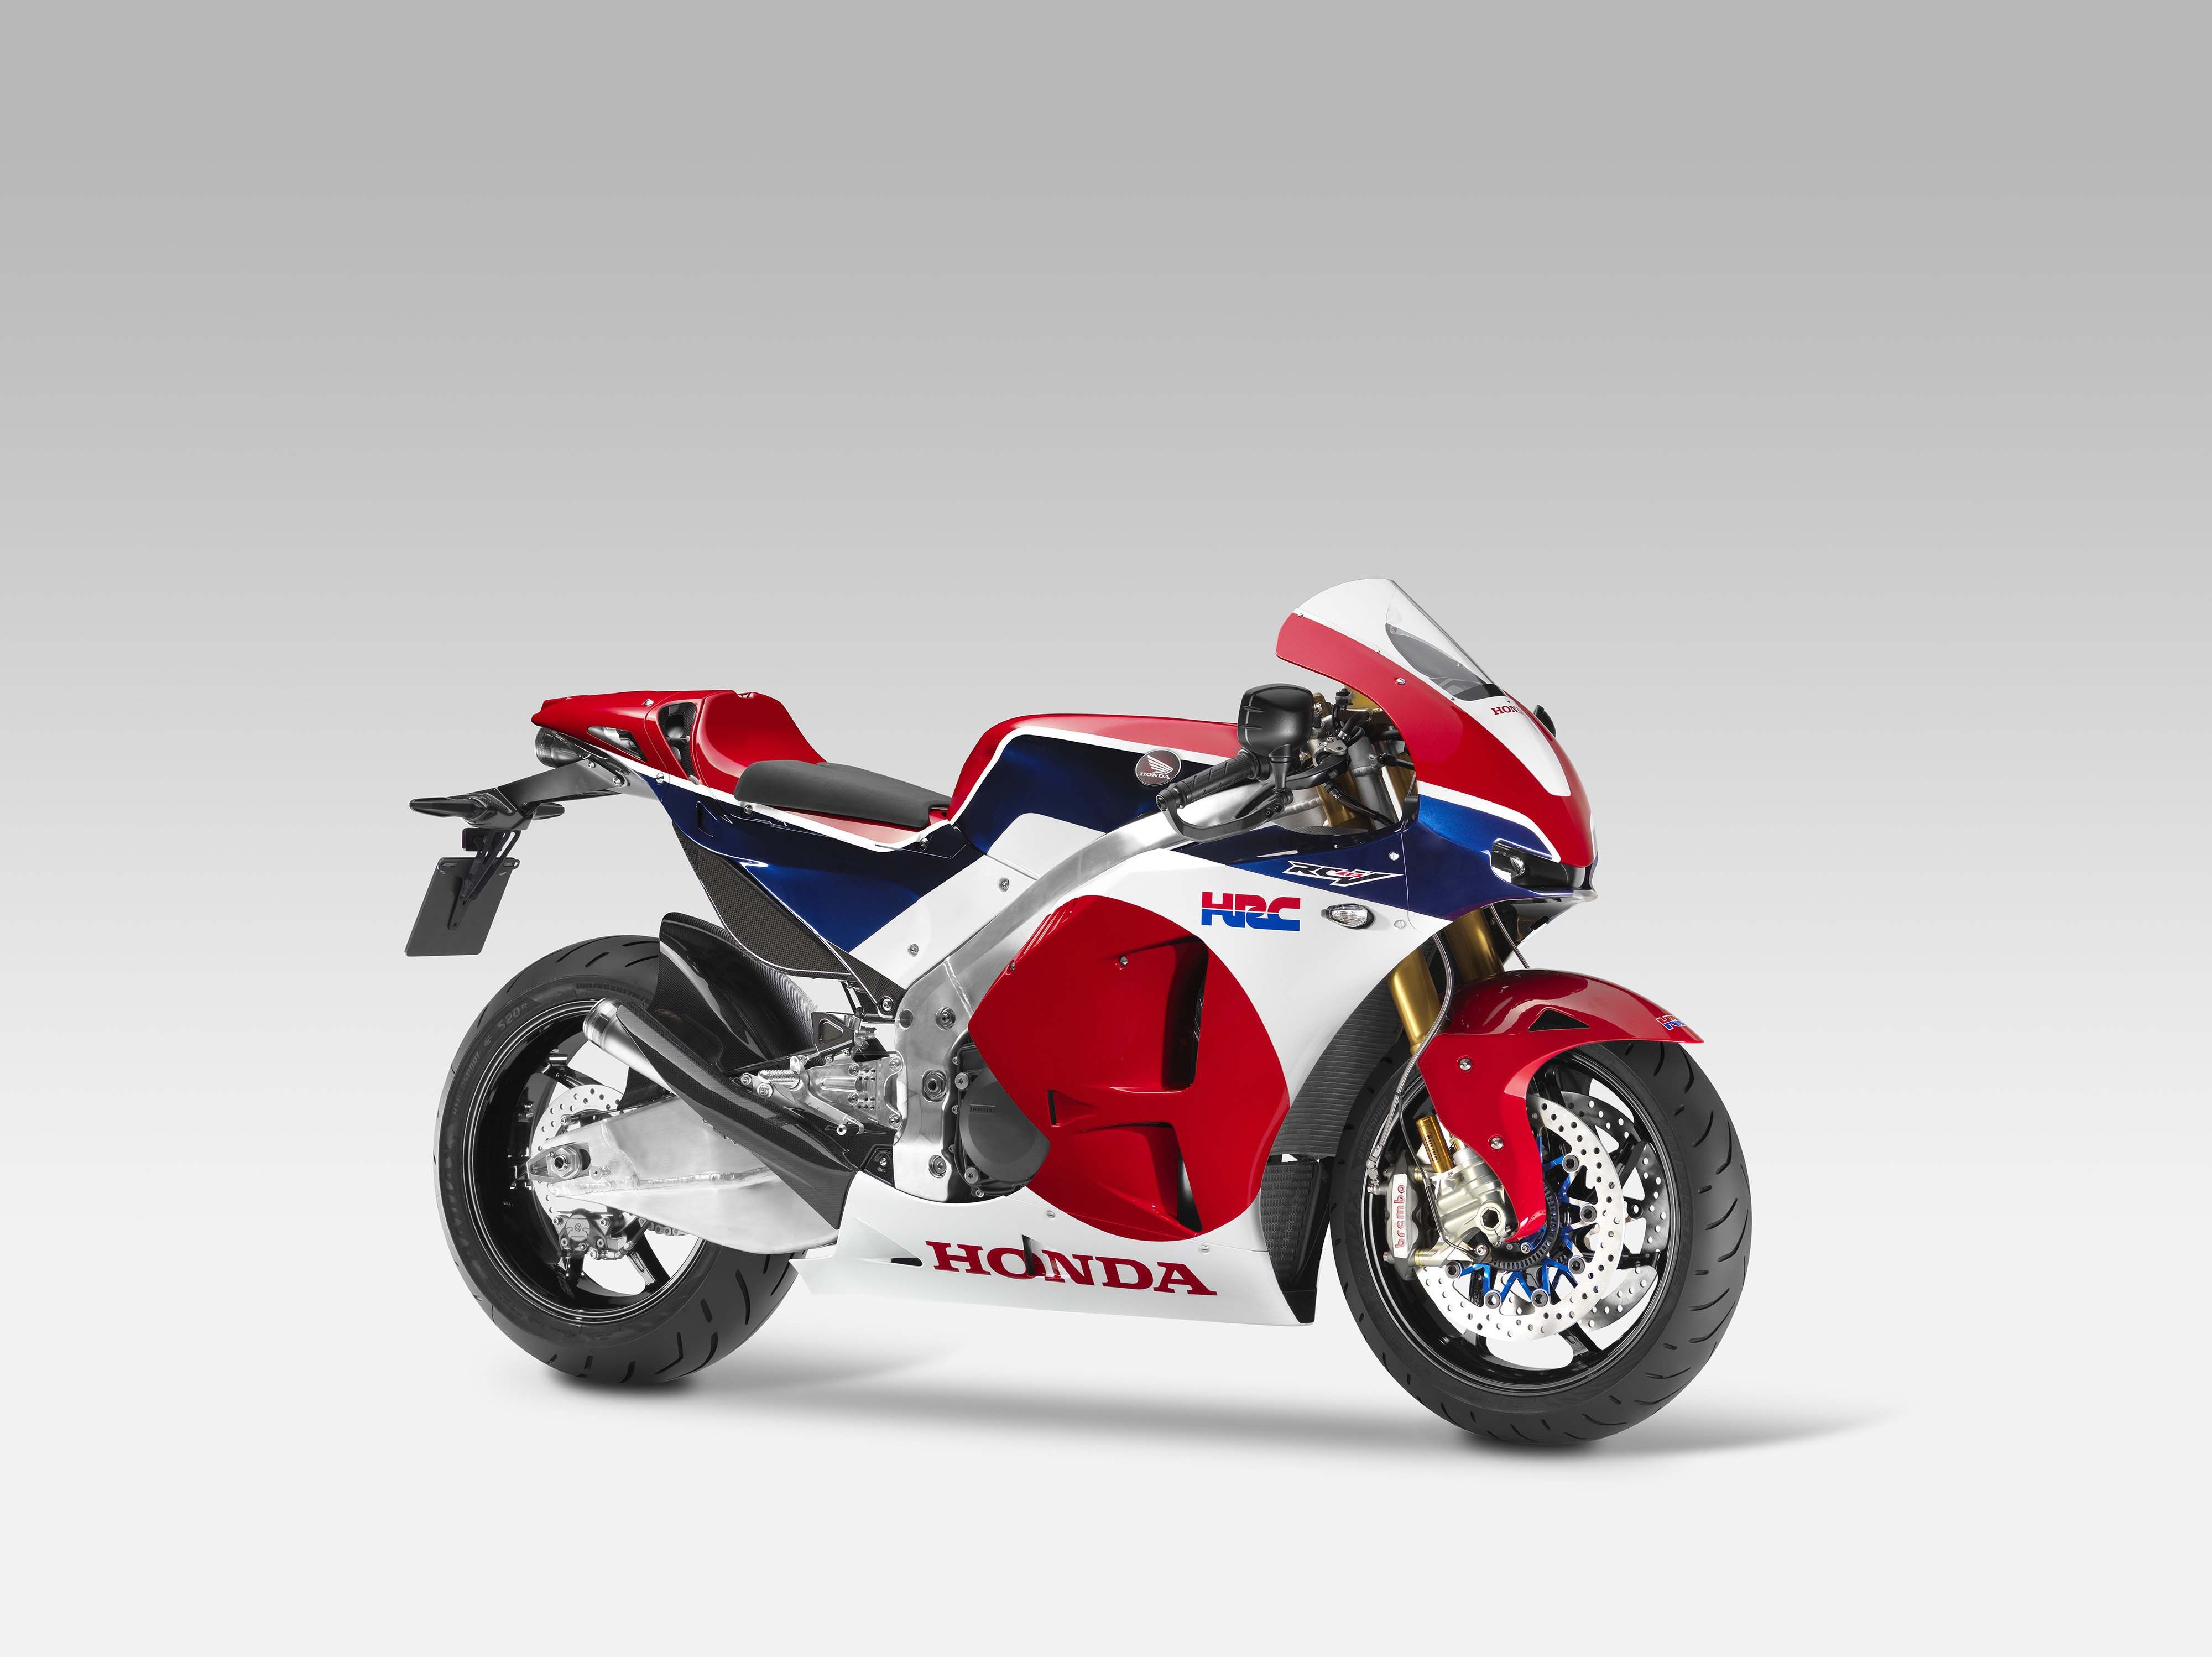 2015 Honda Rc213v S Prototype 01 Jpg 4000 2996 Honda Motorcycles Honda New Motorcycles